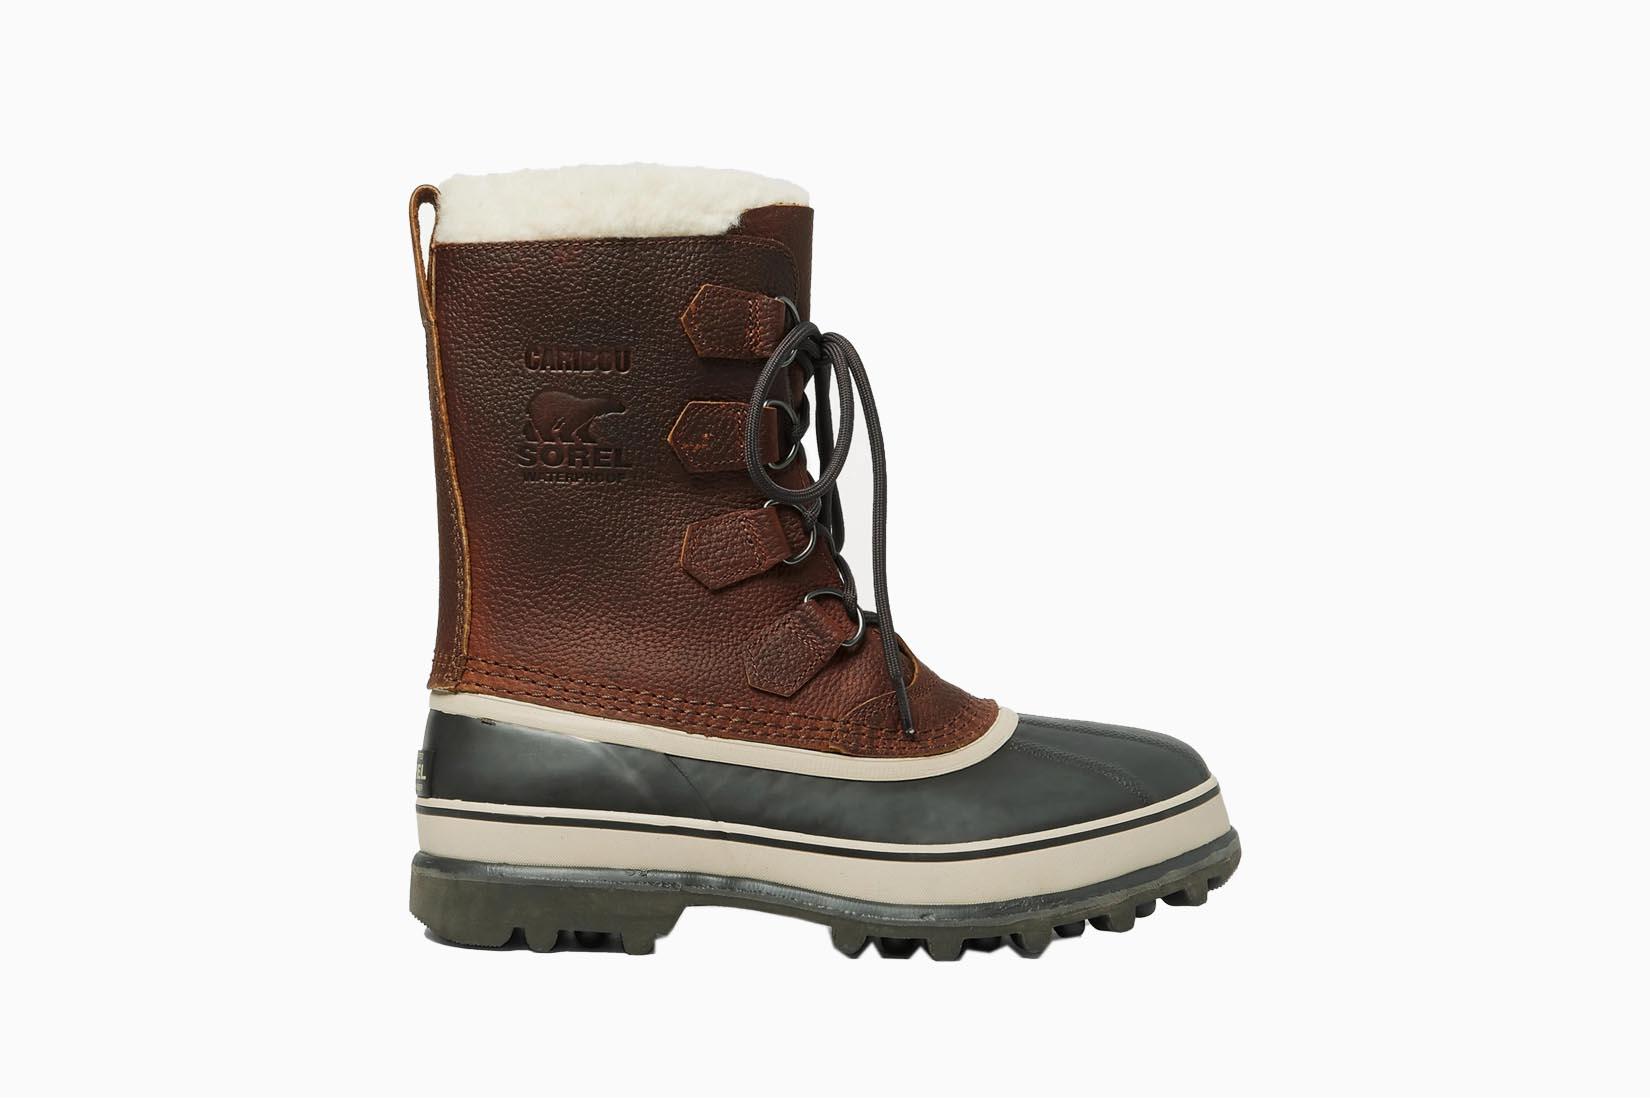 best boots men sorel caribou waterproof snow boots review Luxe Digital